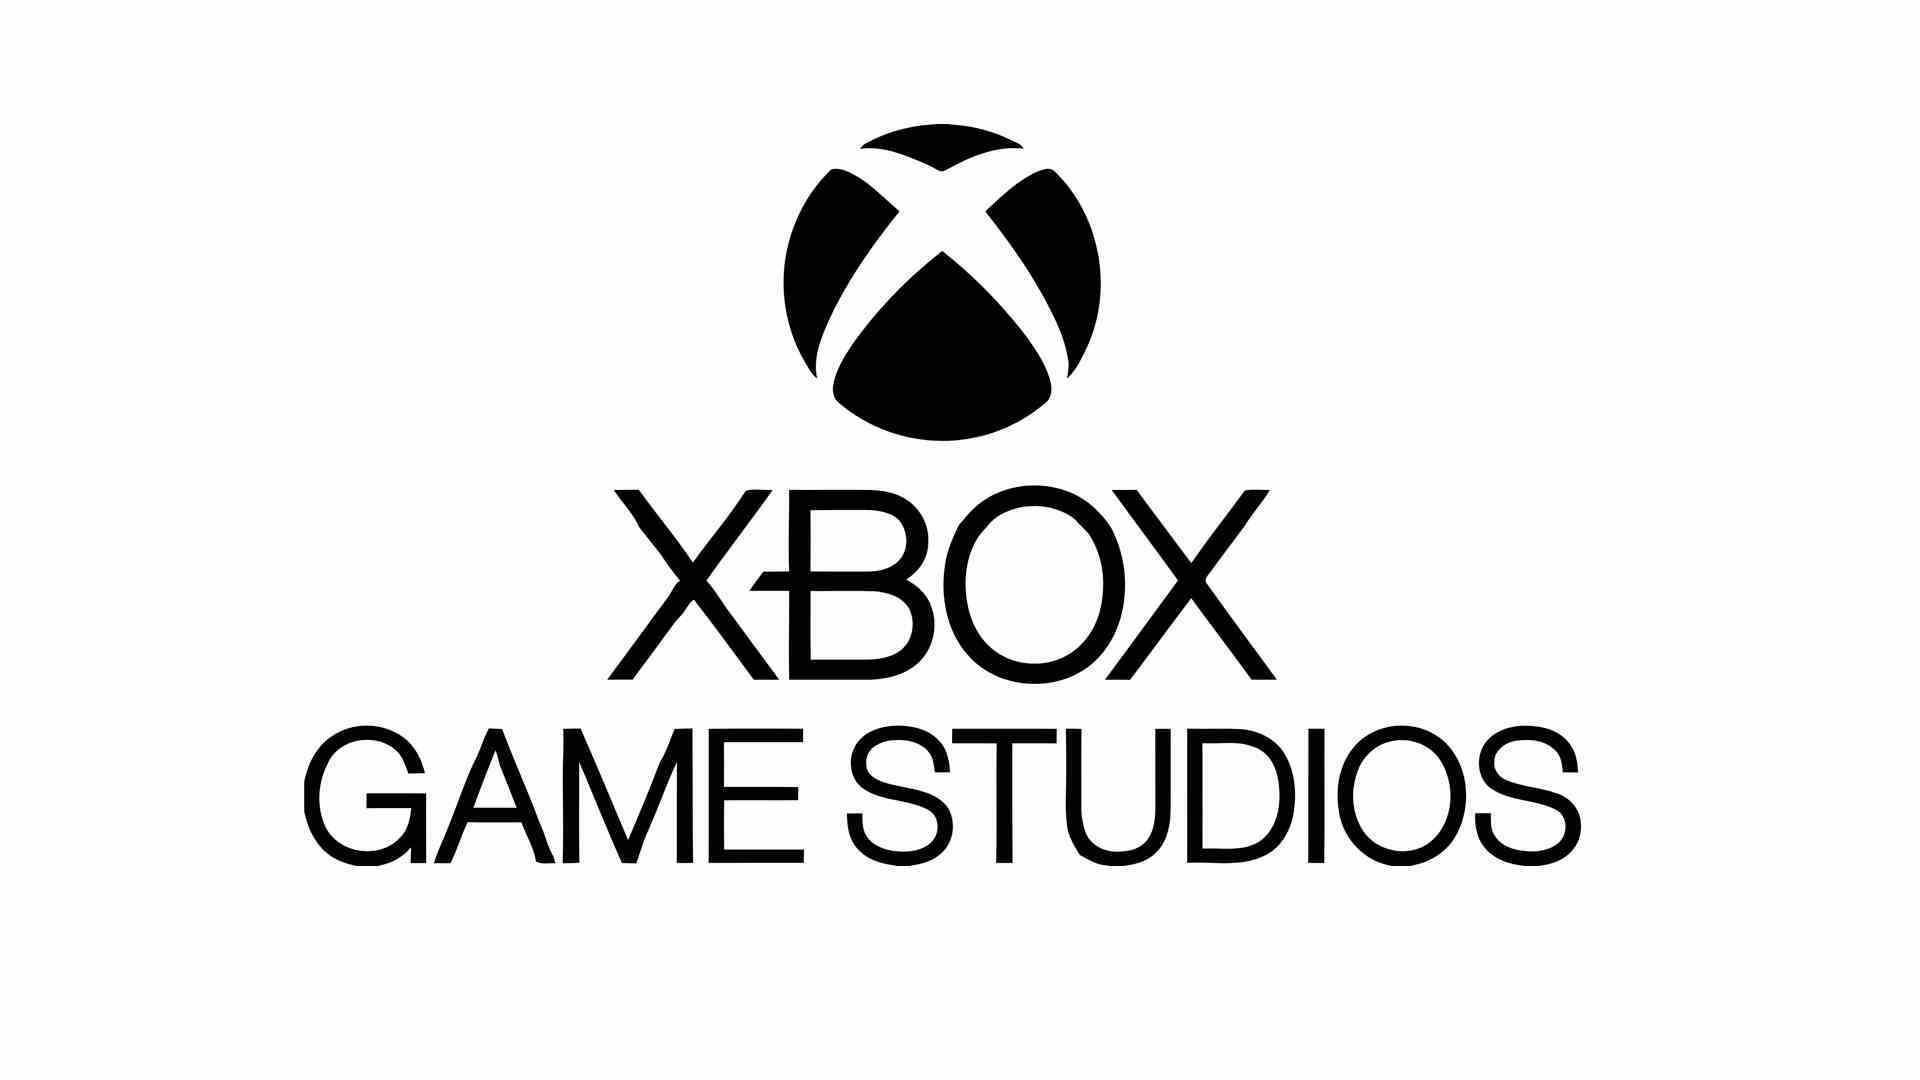 xbox game studios logo